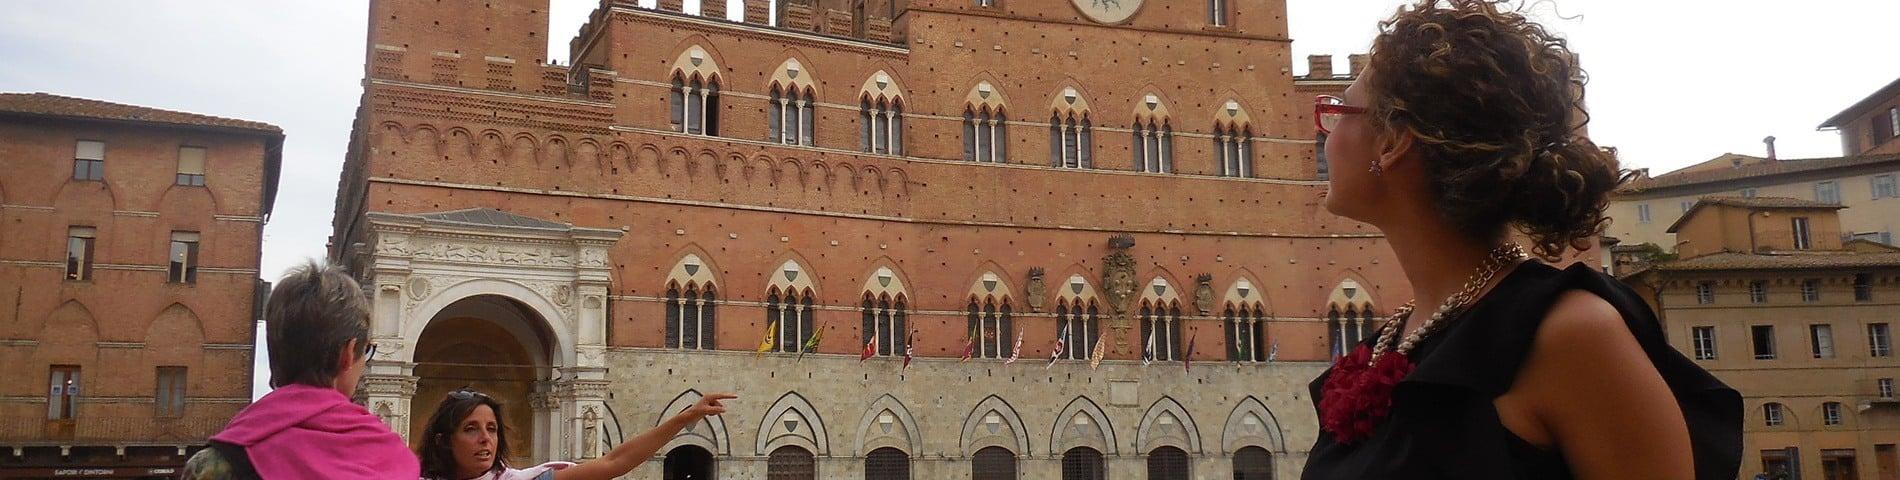 Imatge 1 de l'escola Scuola Leonardo da Vinci